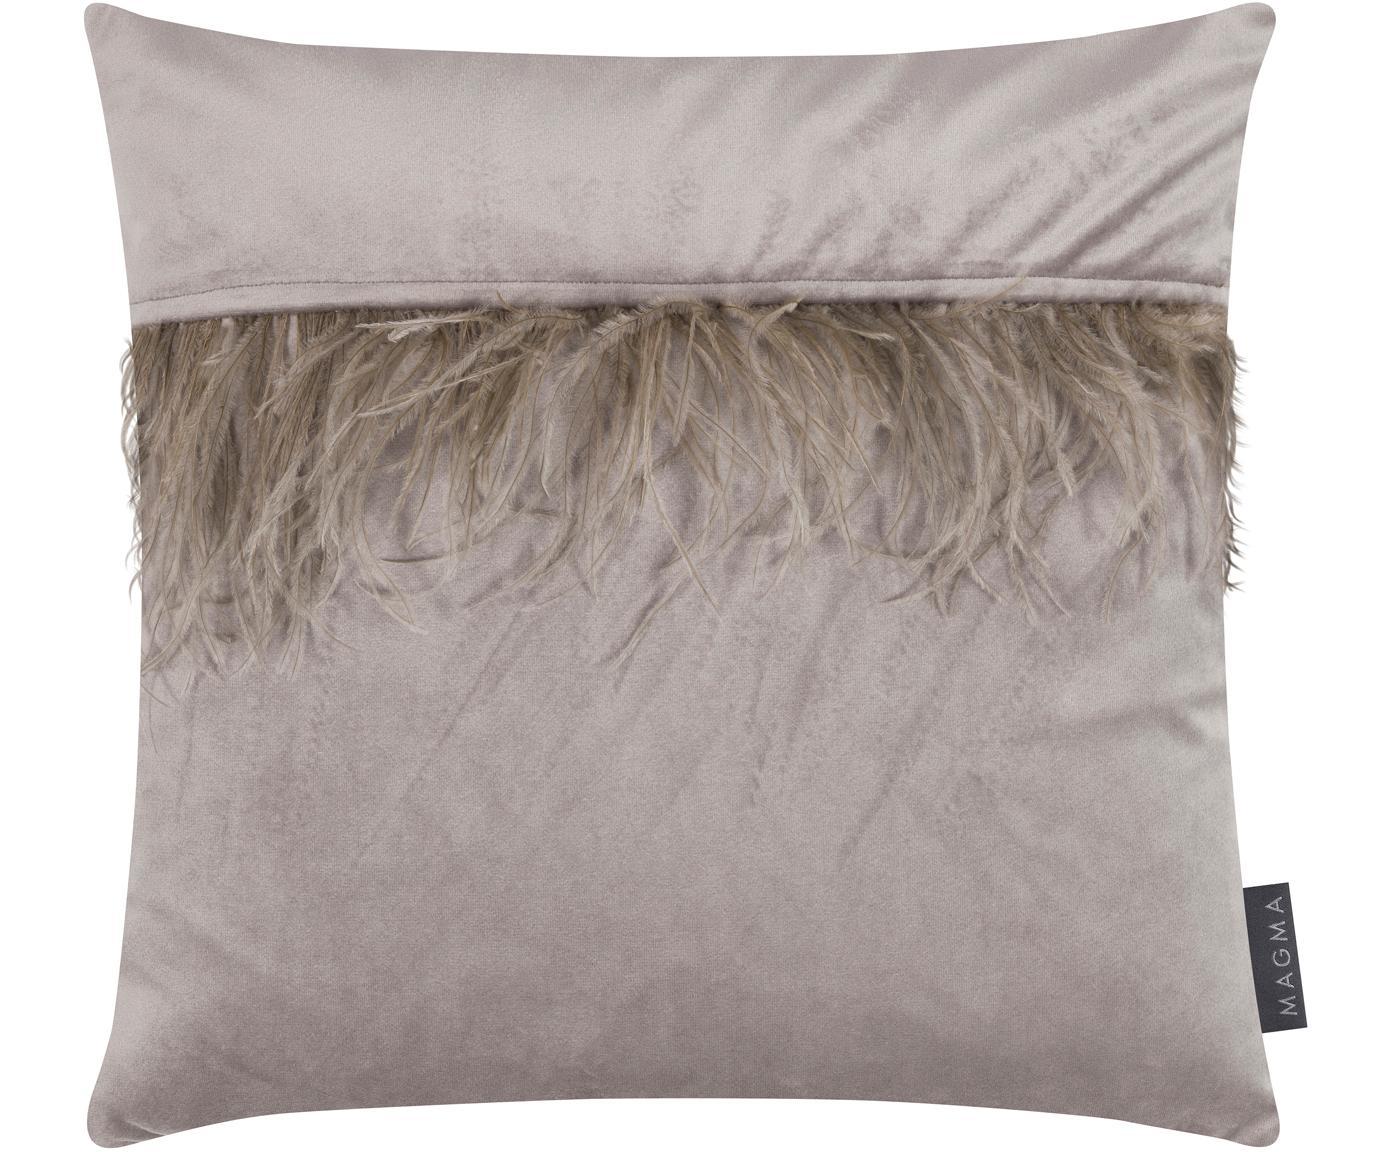 Samt-Kissenhülle Ostrich in Grau mit Federn, Fransen: Straußenfedern, Grau, 40 x 40 cm